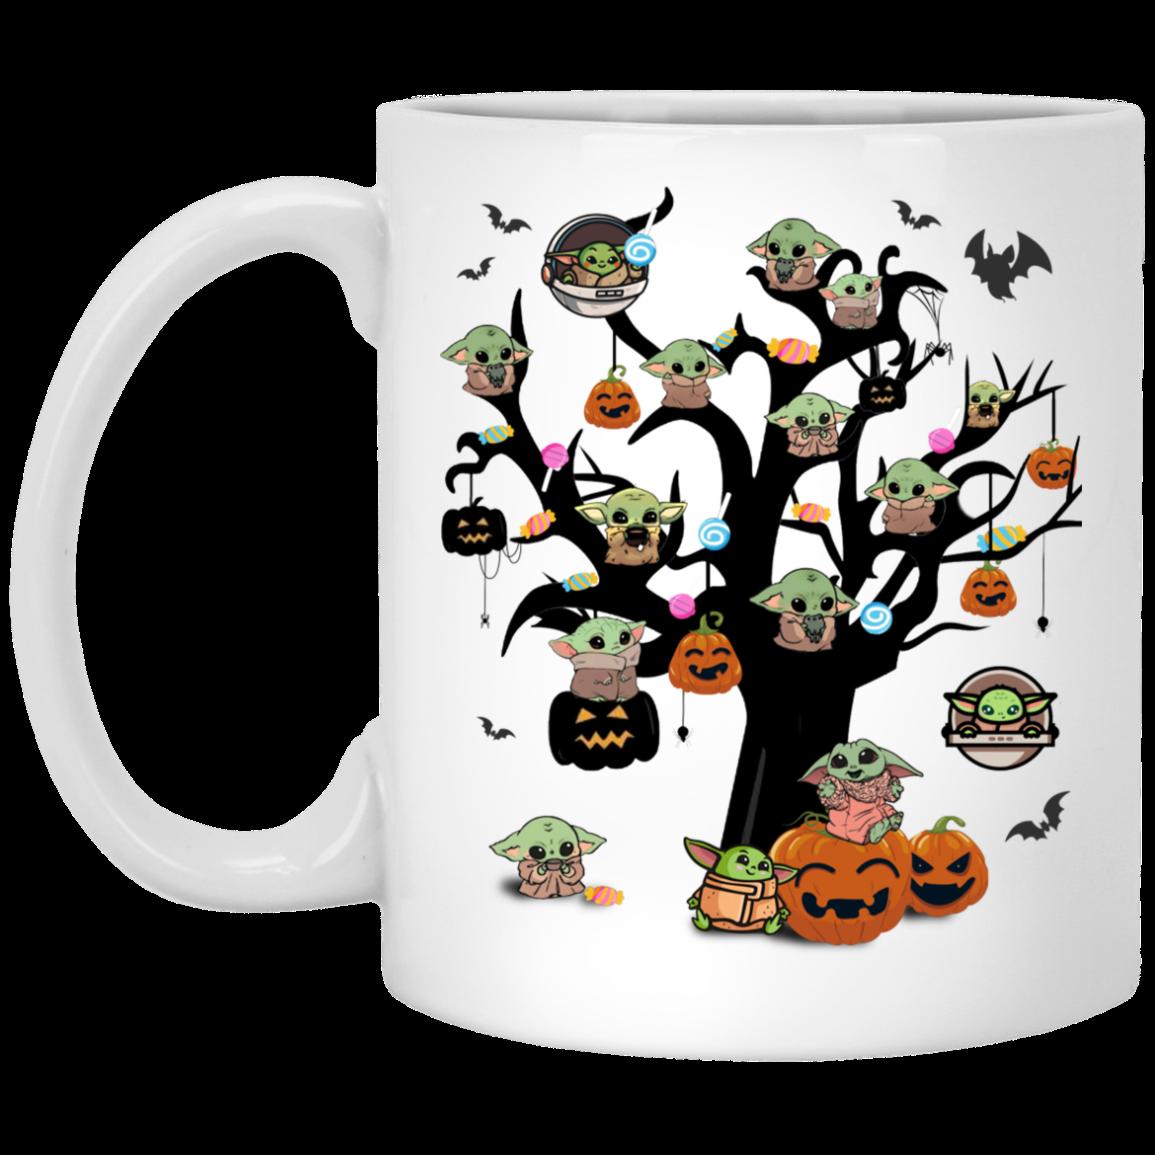 Cute Baby Yoda Tree Halloween Mug Cute Baby Yoda Tree Funny Halloween Coffee Mug Cubebik